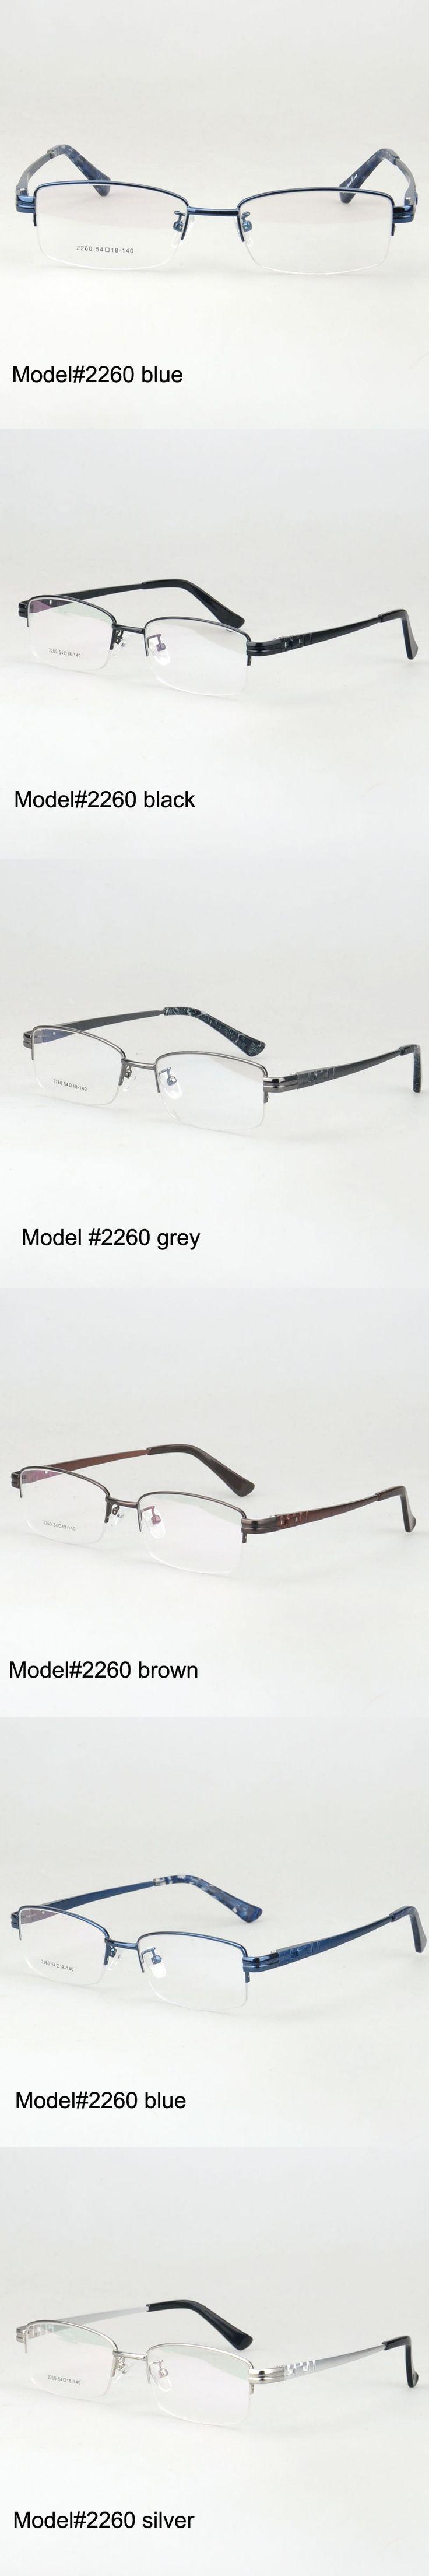 MY DOLI 2260 factory price half rim high quality alloy temple eyewear glasses spectacles myopia optical frame eyewear eyeglasses